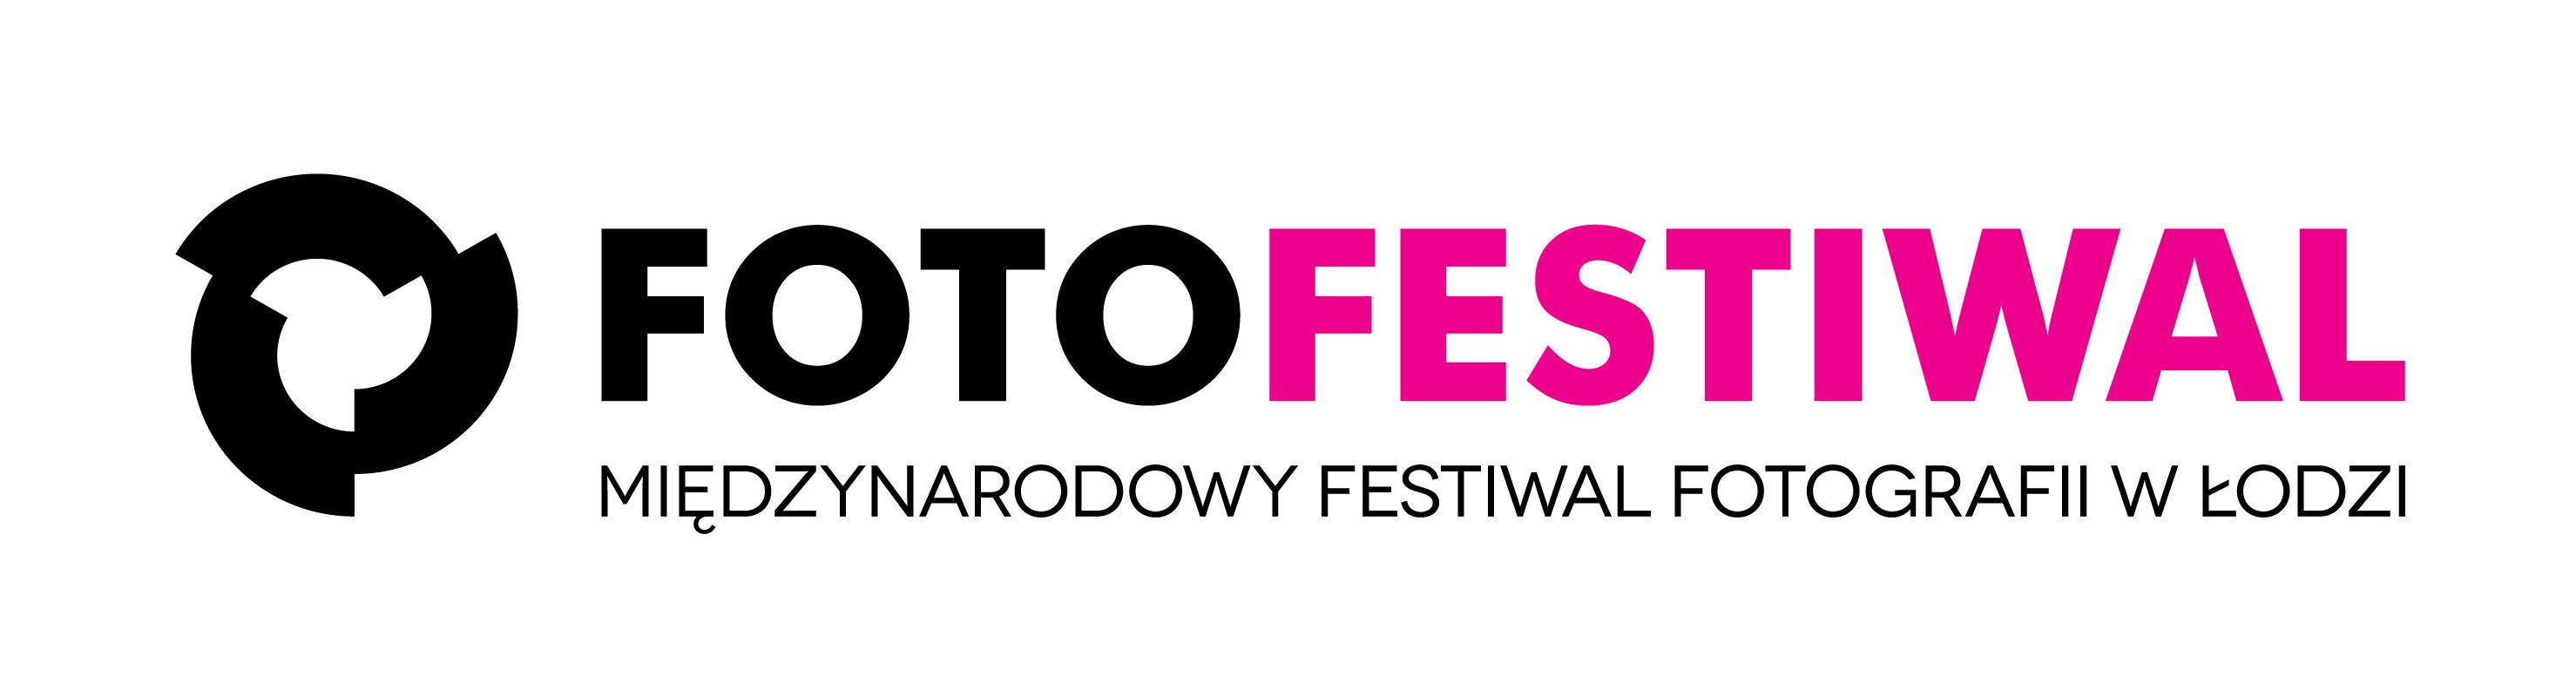 fotofestiwal_logo_uni_name_pl_color_rgb